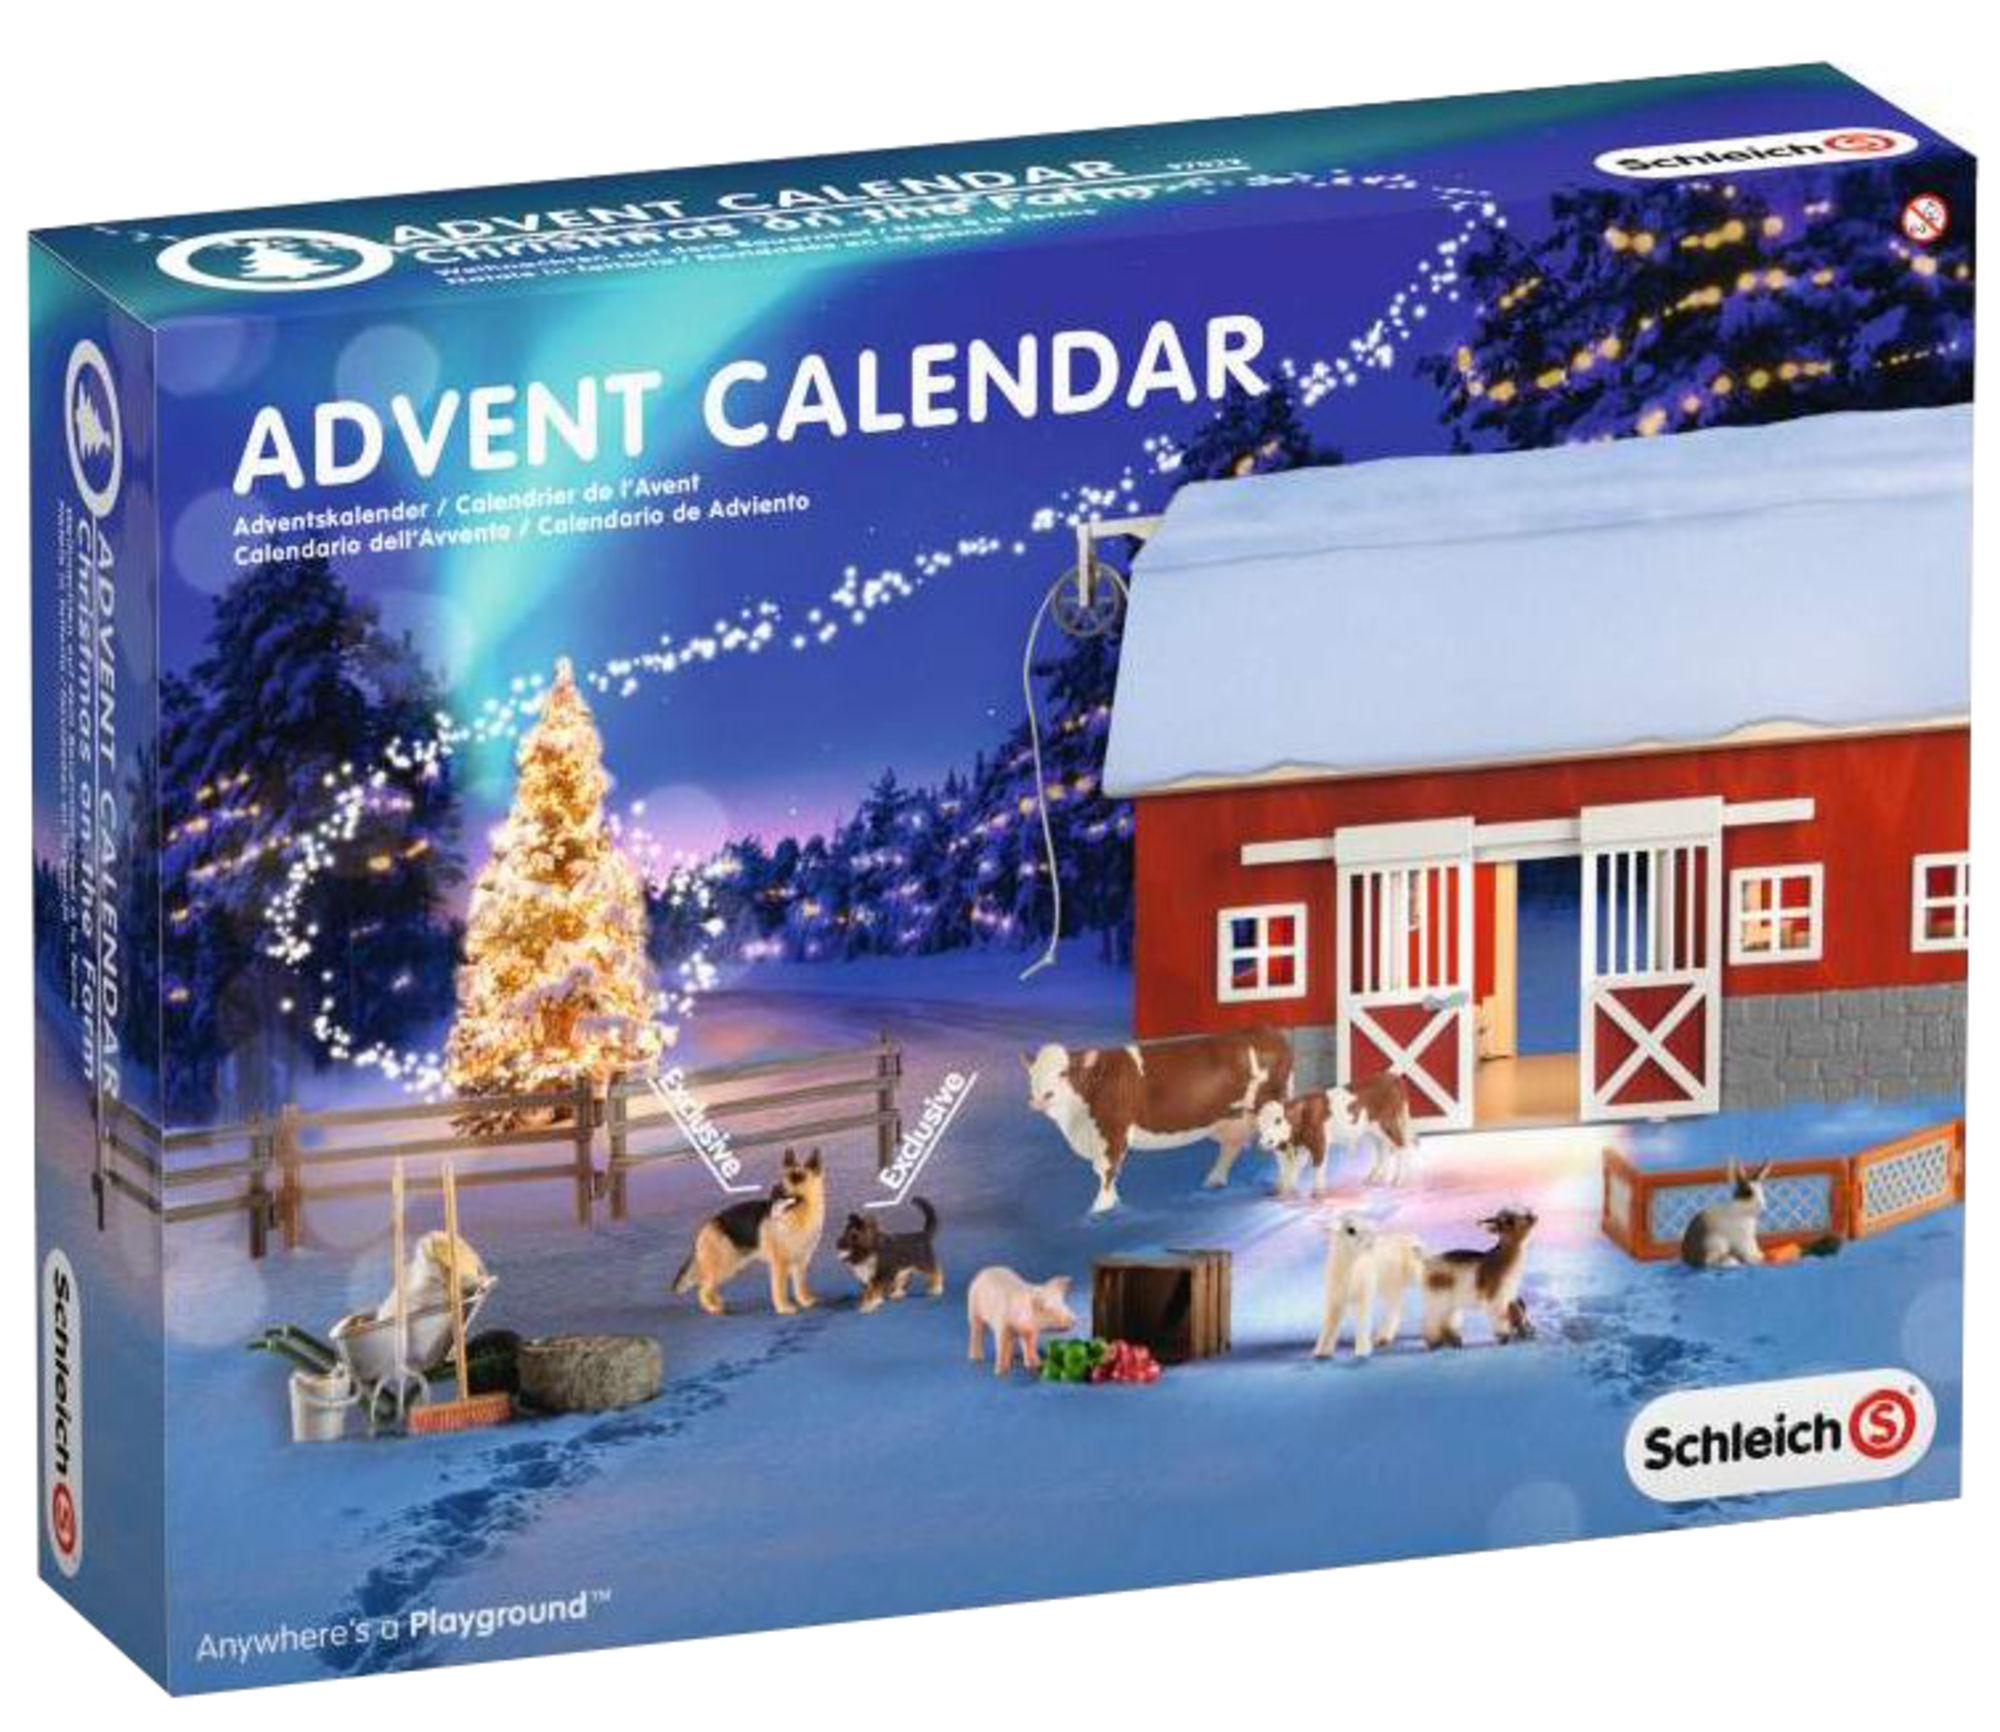 schleich joulukalenteri 2018 Schleich joulukalenteri maatila | Hintaseuranta.fi schleich joulukalenteri 2018